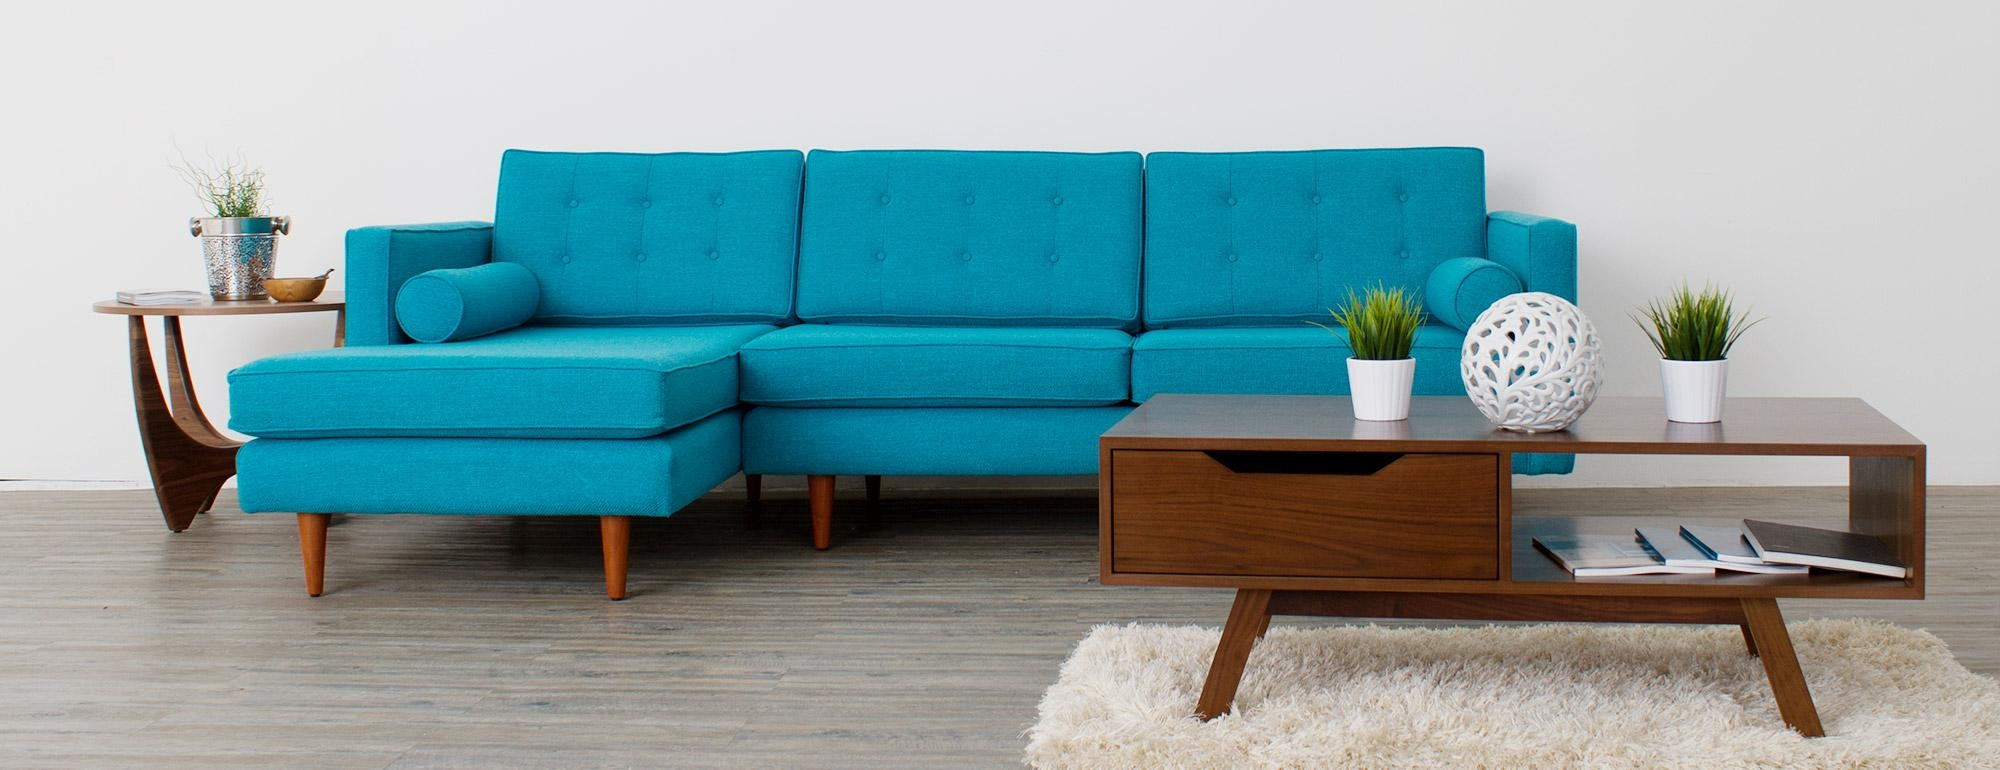 Braxton Sectional | Joybird Inside Braxton Sofas (Image 10 of 20)